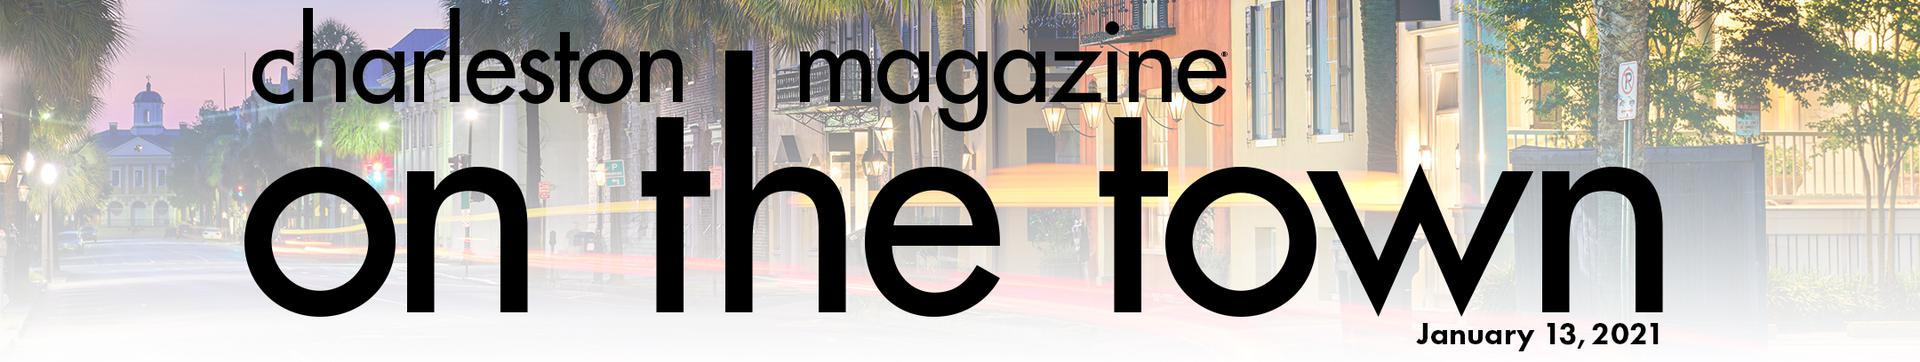 Charleston magazine On the Town